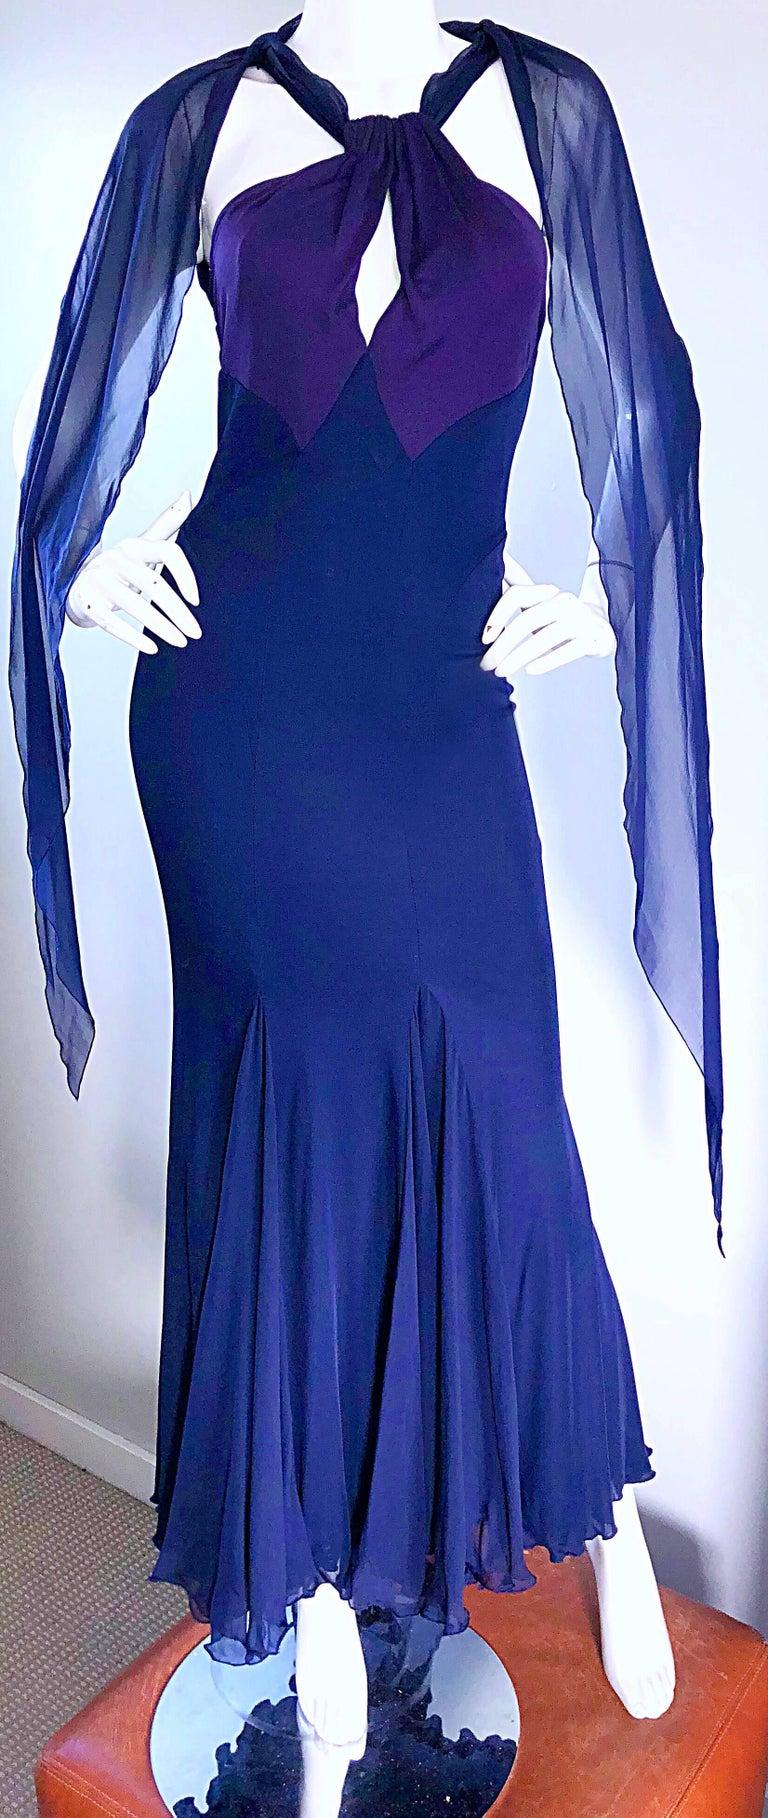 7aa45679d0 Bill Blass Vintage Silk Jersey and Chiffon Navy Blue Purple Grecian Evening  Gown For Sale 2